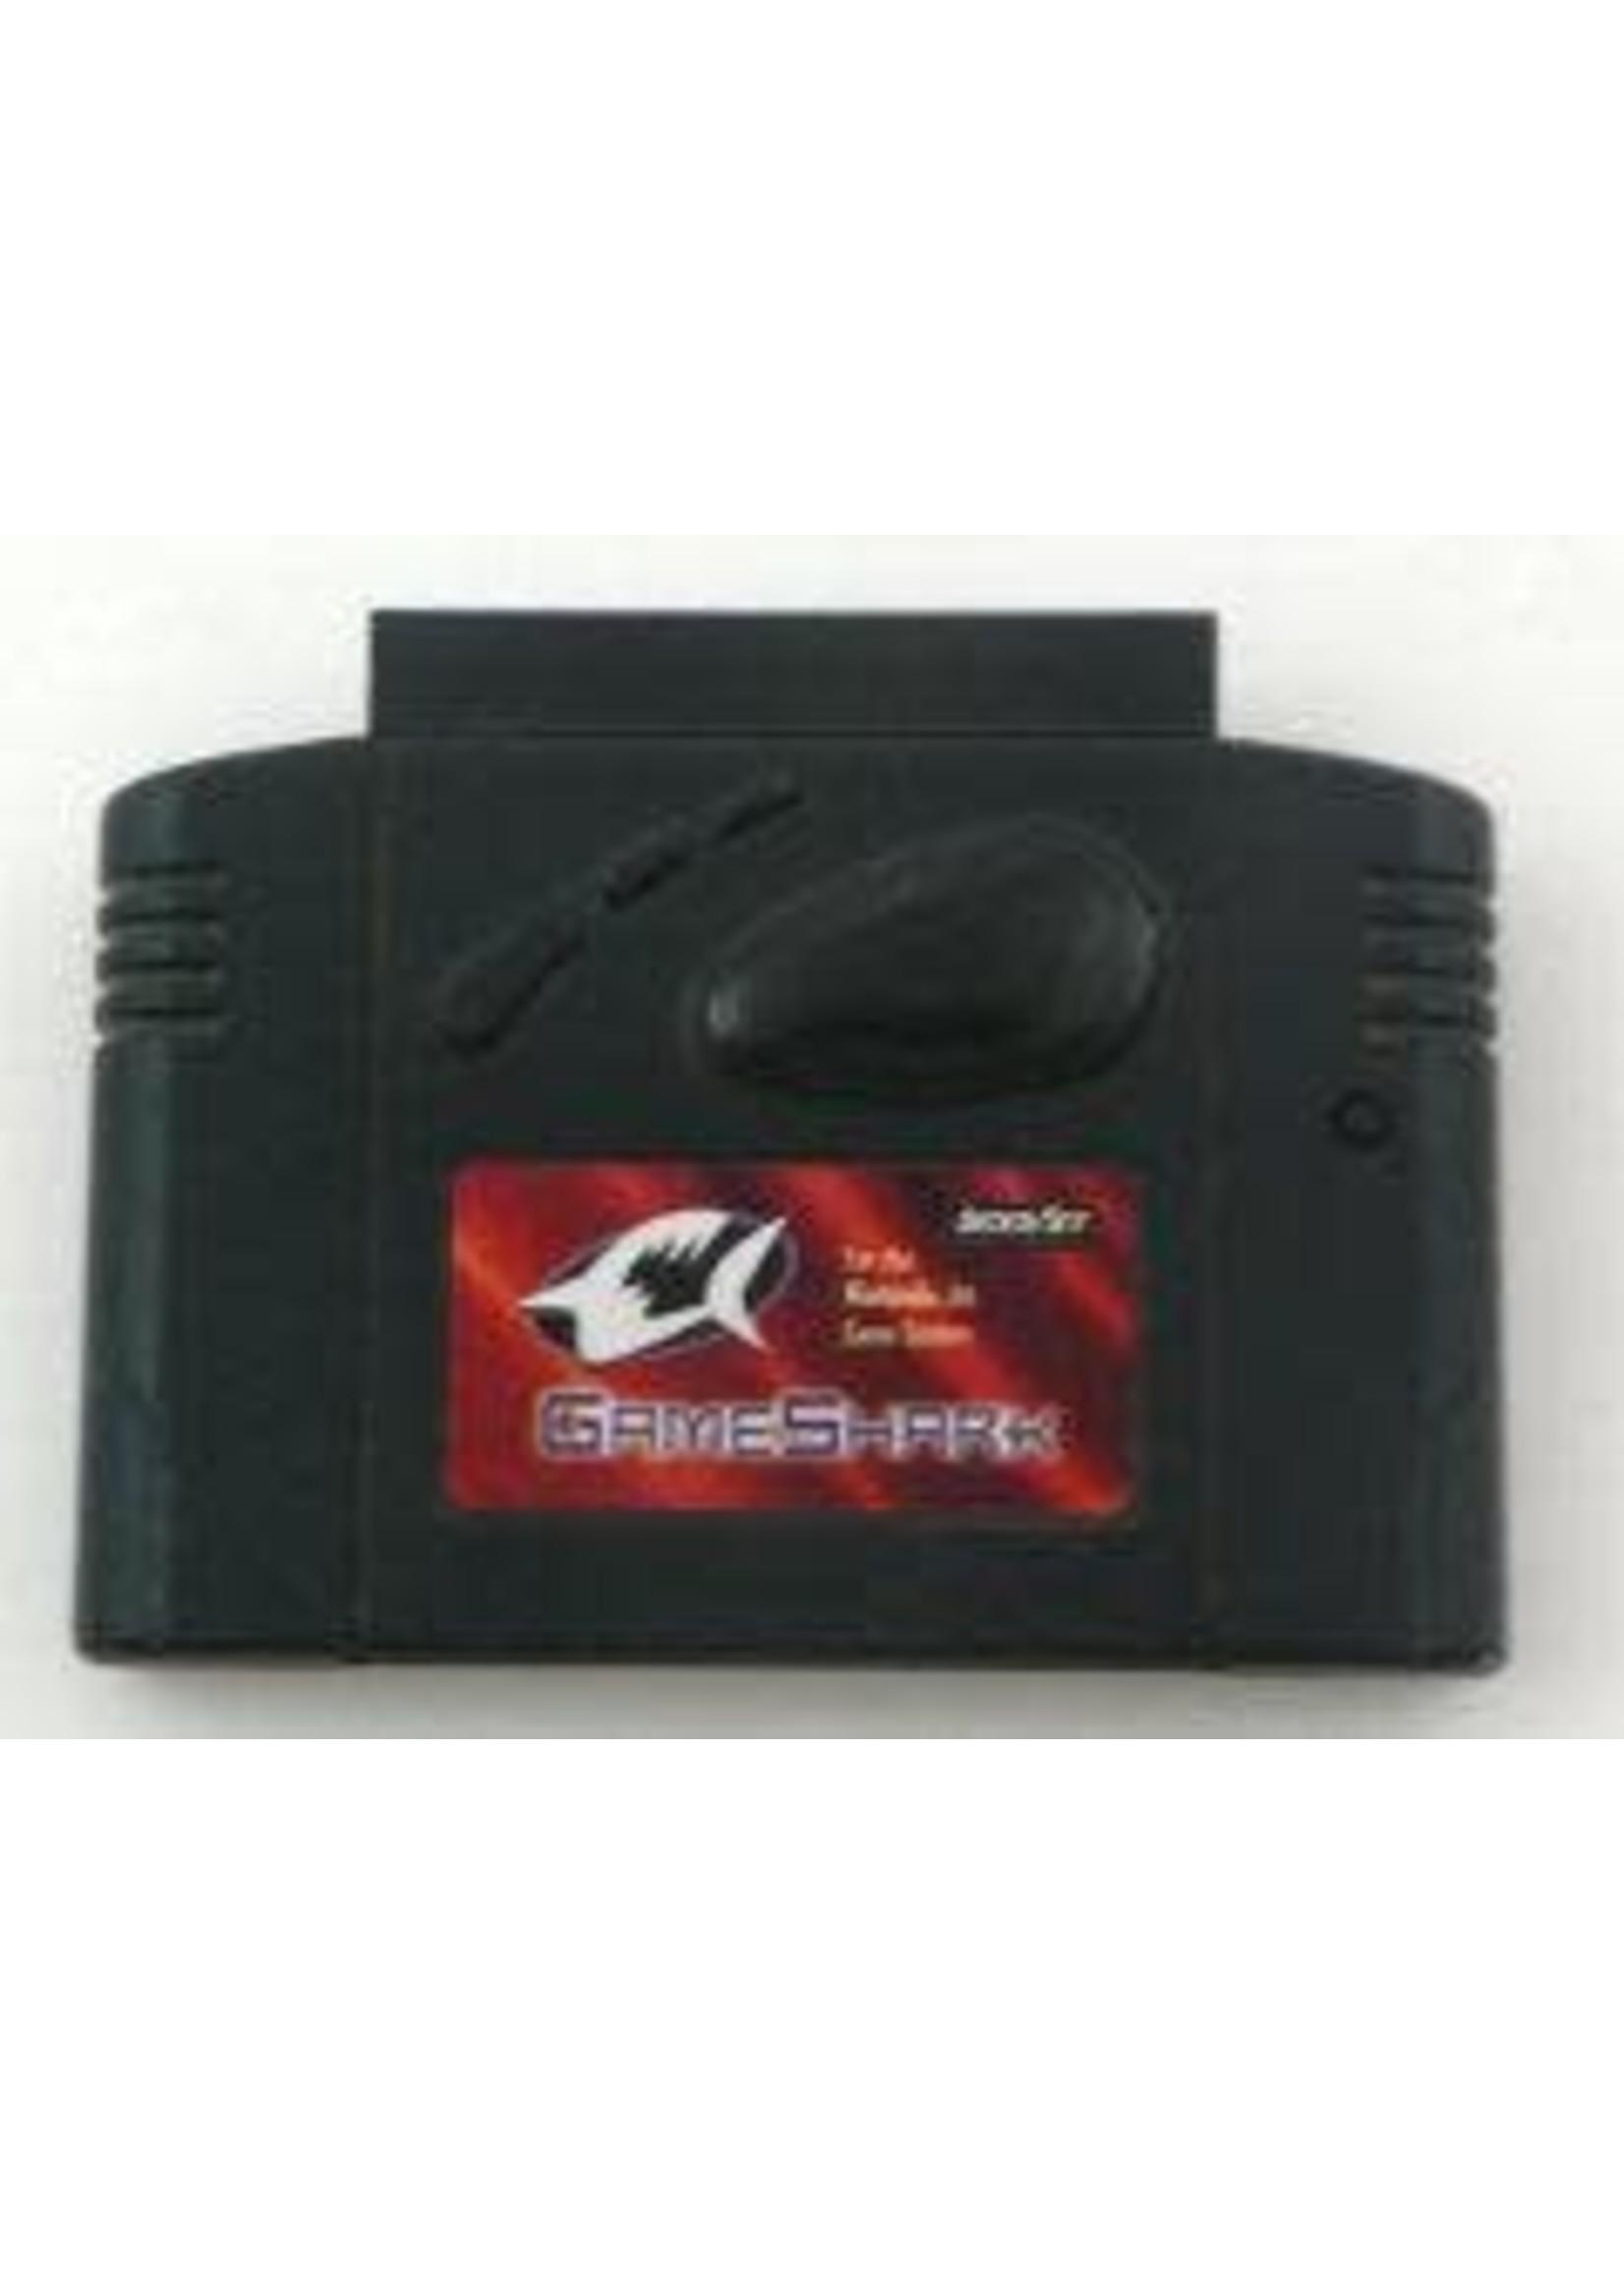 Gameshark Nintendo 64